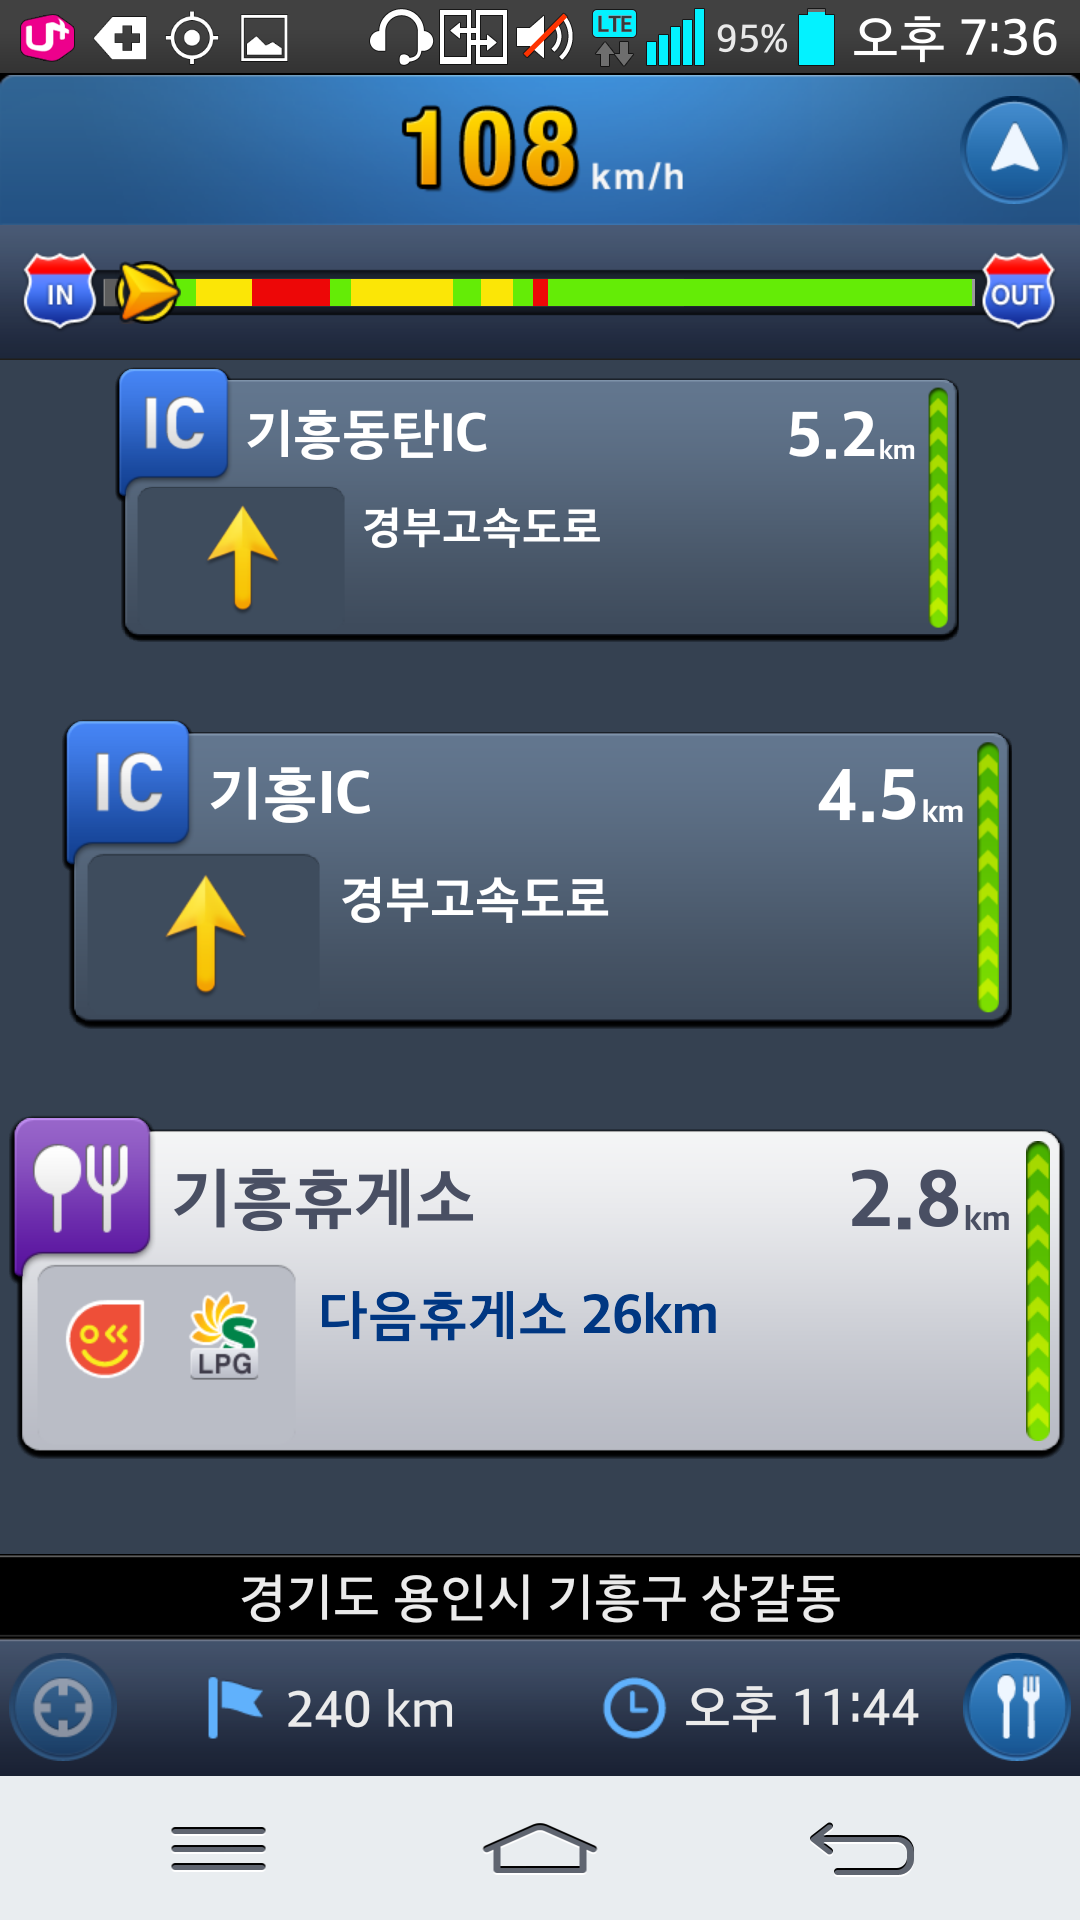 U+navi LTE, U+navi LTE 데이타, 네비게이션 어플, 내비게이션 어플, 네비게이션 데이터 사용량, U+navi LTE 데이터 사용량, T맵 데이터 사용량, 올레네비 데이터 사용량, IT, 모바일, 자동차, 추석, 설날,U+navi LTE 데이터 사용량을 간이로 확인 해 봤습니다. T맵 올레네비 비교도 간단하게 해보도록 하죠. 추석과 설날 처럼 대목에는 네비게이션의 사용량이 상당히 많긴 한데요. 실제 저도 집에 오면서 U+navi LTE를 사용해보고 그리고 T맵과 올레네비도 사용해봤습니다. 물론 가장 많이 사용하는 네비게이션 어플이 무조건 좋다고 말할 수 는 없습니다. 자신이 편한 네비게이션을 쓰면 되니까요. 각 통신사마다 제공하는 네비게이션 어플이 따로 있으니 그것을 써도 되고 아니면 통신사 상관없이 쓸 수 있는 앱들도 있으니 그것을 써도 좋죠. 추석을 맞아서 집에 내려 오면서 폰 2개로 3개의 네비게이션 어플을 써 봤는데요. 각각 조금씩 장단점은 있더군요.  U+navi LTE는 데이터 다운 받는 과정 없이 바로 진행이 되어서 속도가 좀 빠른 편이였구요. 화면 구성도 나쁘지 않았습니다. T맵은 오랫동안 많은 사람에게 사랑을 받은 만큼 메뉴 구성 부분이 꽤 잘 꾸며져 있었구요. 올레네비 경우에도 화면 구성은 크게 나쁘지 않았습니다. 그런데 T맵은 쓰는 사람이 너무 많아서 인지 어느 구역에서 서비스가 안되는 구역이 생기더군요. 이유를 생각해보면 쓰는 사람이 너무 많아서 였습니다. 고속도로 위에서 그런 상황이 실제로 있었는데 그래서 캡쳐도 해놓았습니다. 정말 중요한 상황에 이렇게 되면 어떠했을까 라는 걱정이 살짝 생기더군요. T맵이 안되는 그 상황에서 U+navi LTE는 정상작동 하더군요. 일단 여기에서는 U+navi LTE 기준으로 조금 설명해보겠습니다.